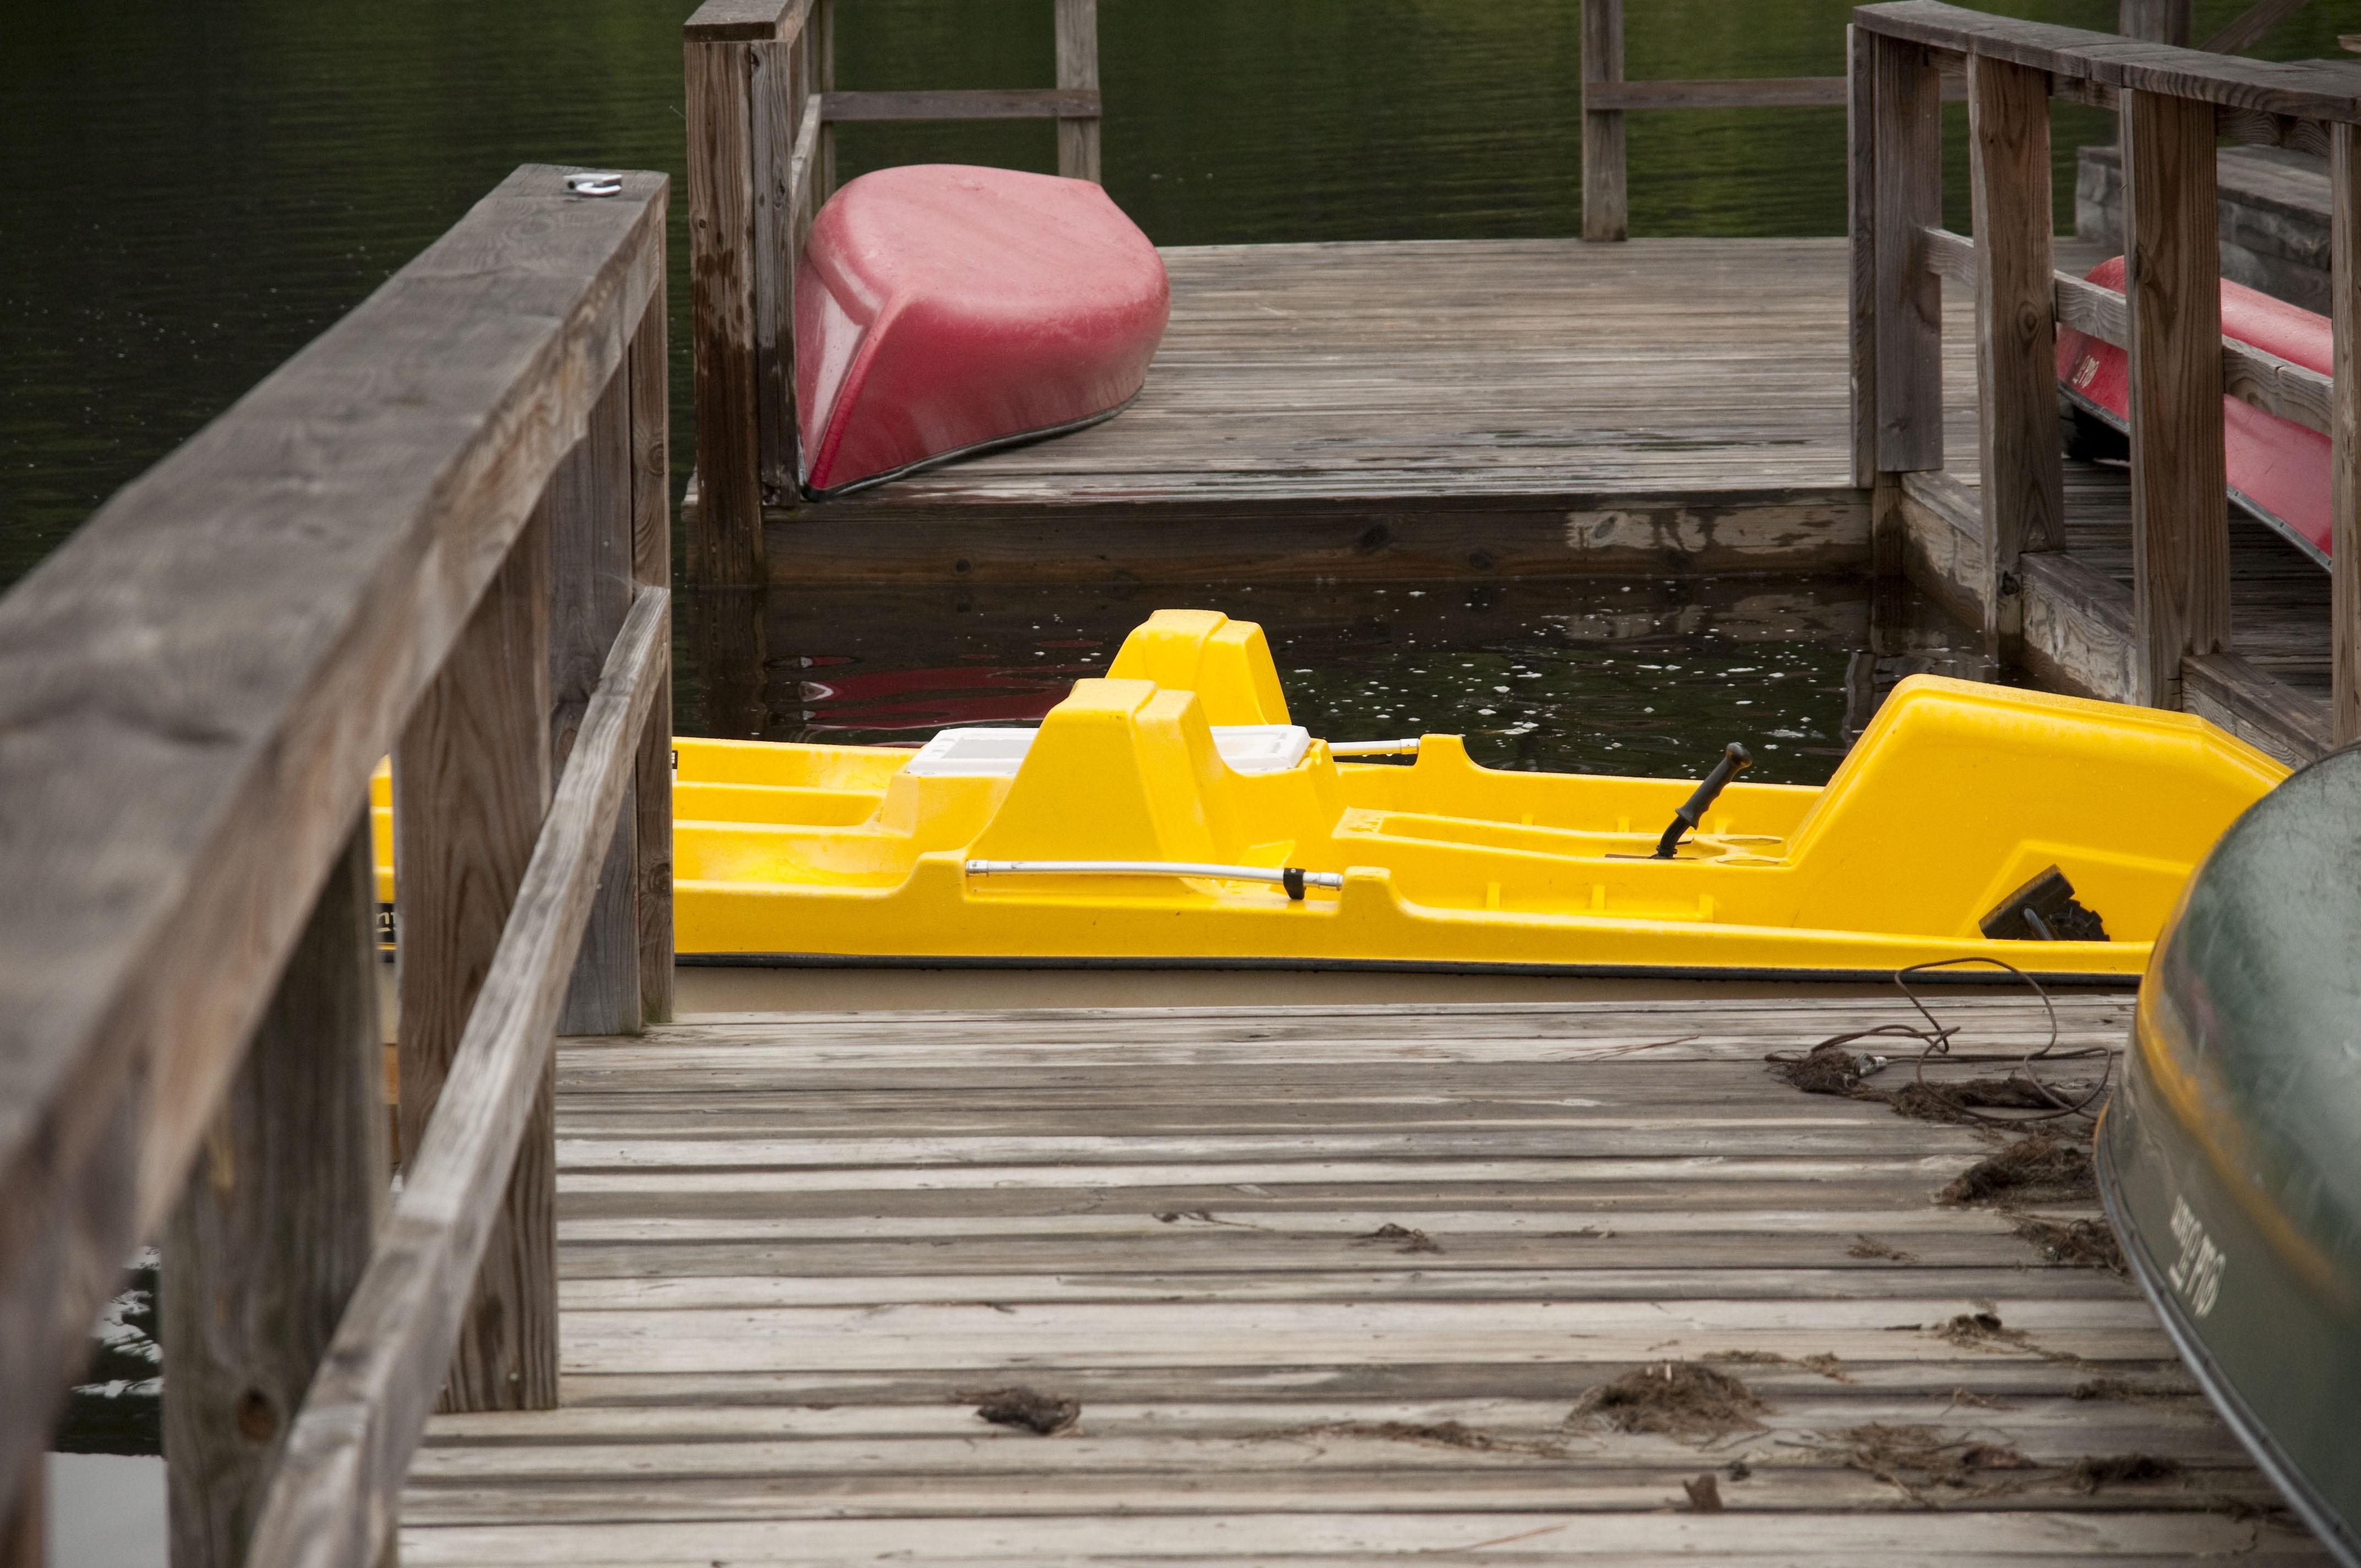 Table Water Wood Floor Lake Vehicle Furniture Kayak North Carolina Water  Sport Wooden Dock Boat Dock